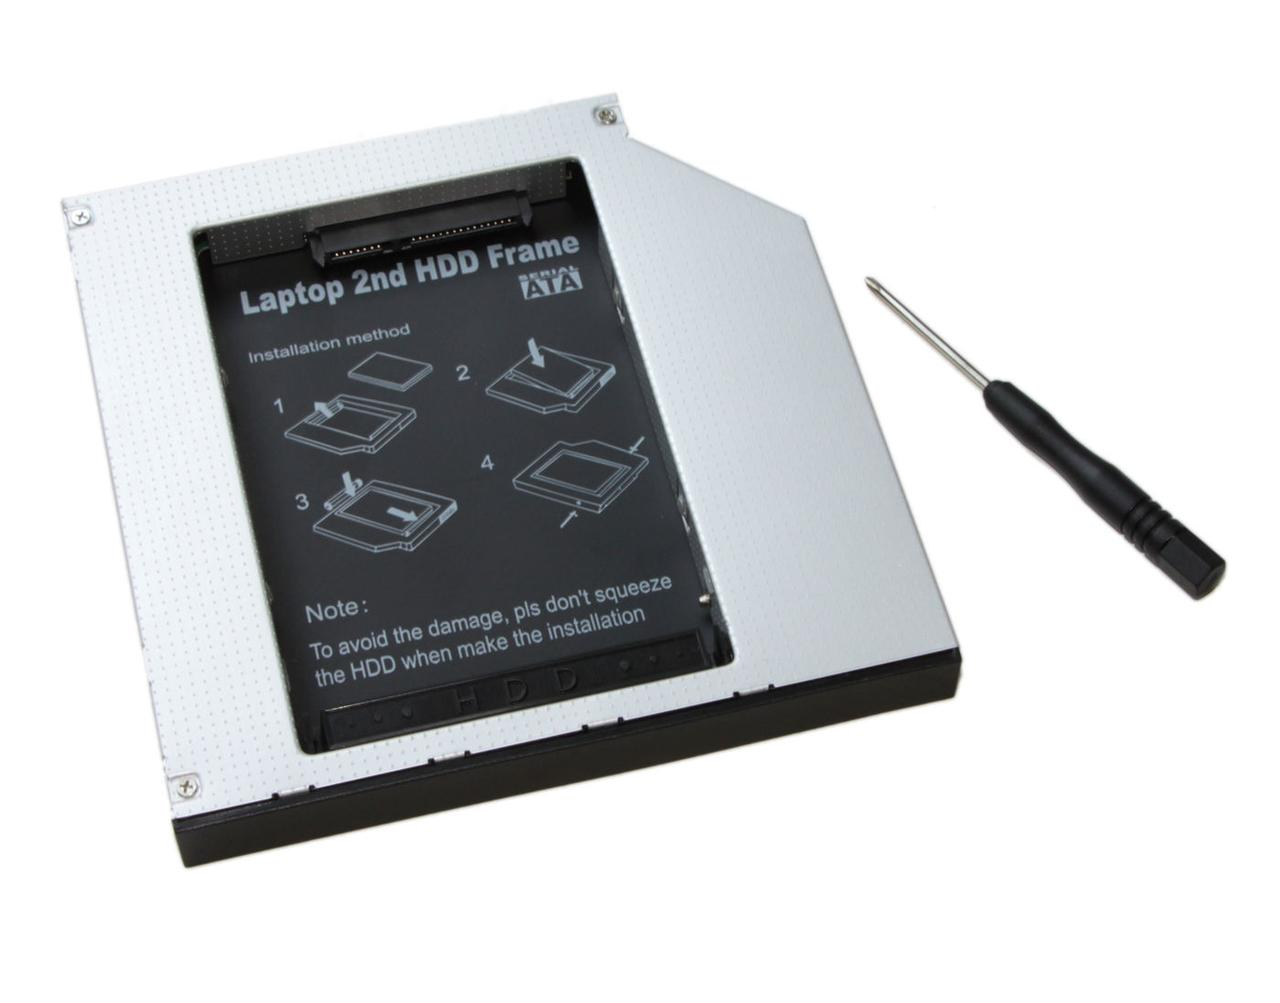 Шасси Maiwo NSTOR-12-IDE для подключ. 2,5 HDD/SSD SATA в отсек привода IDE толщ. 12,7 мм алюм